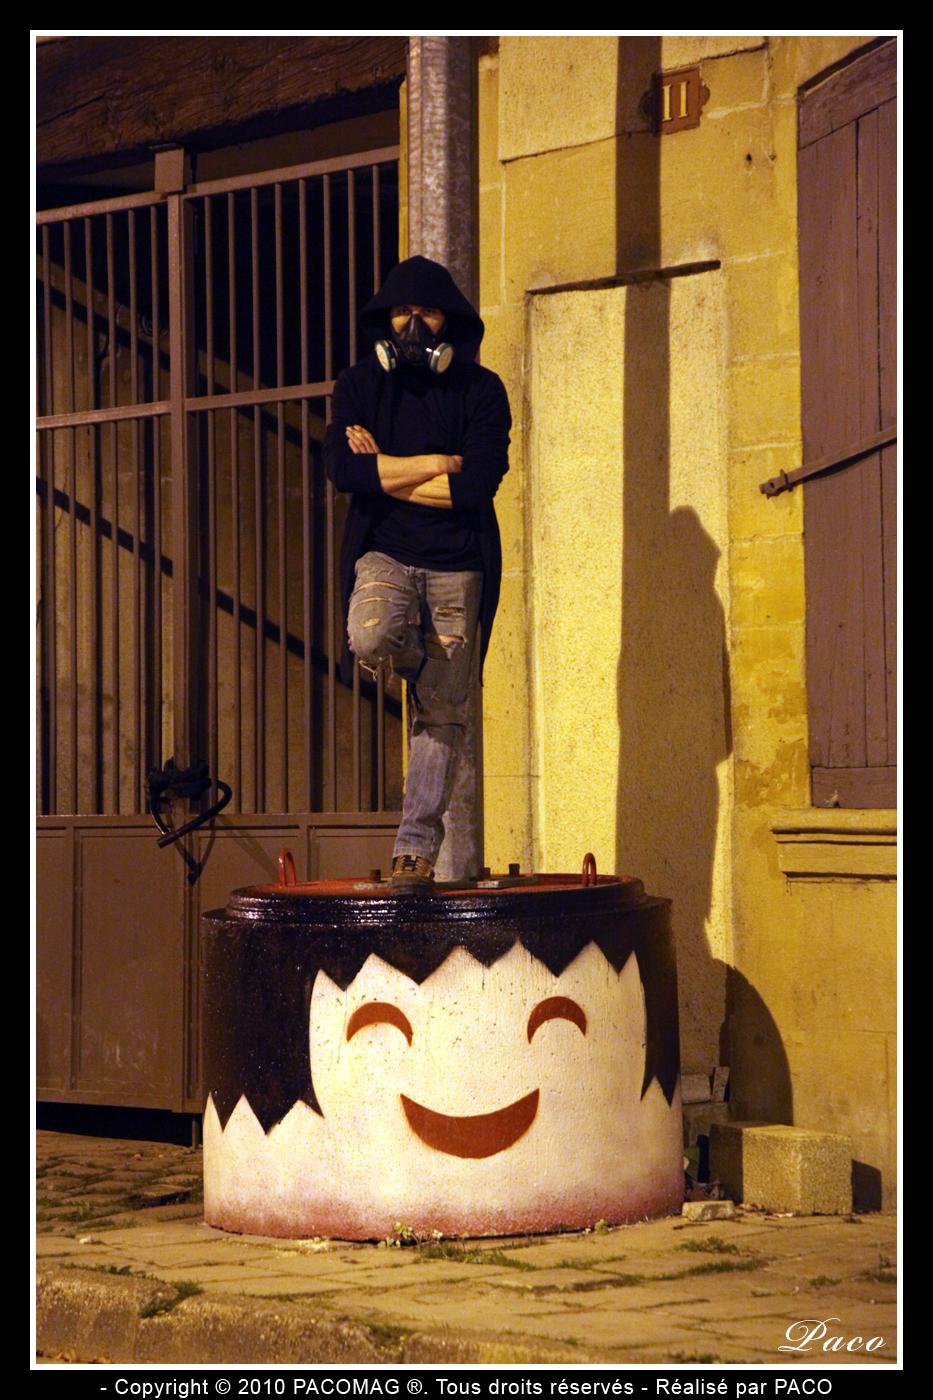 Street art playmobil de Paco illustrateur graphiste ville de Sedan